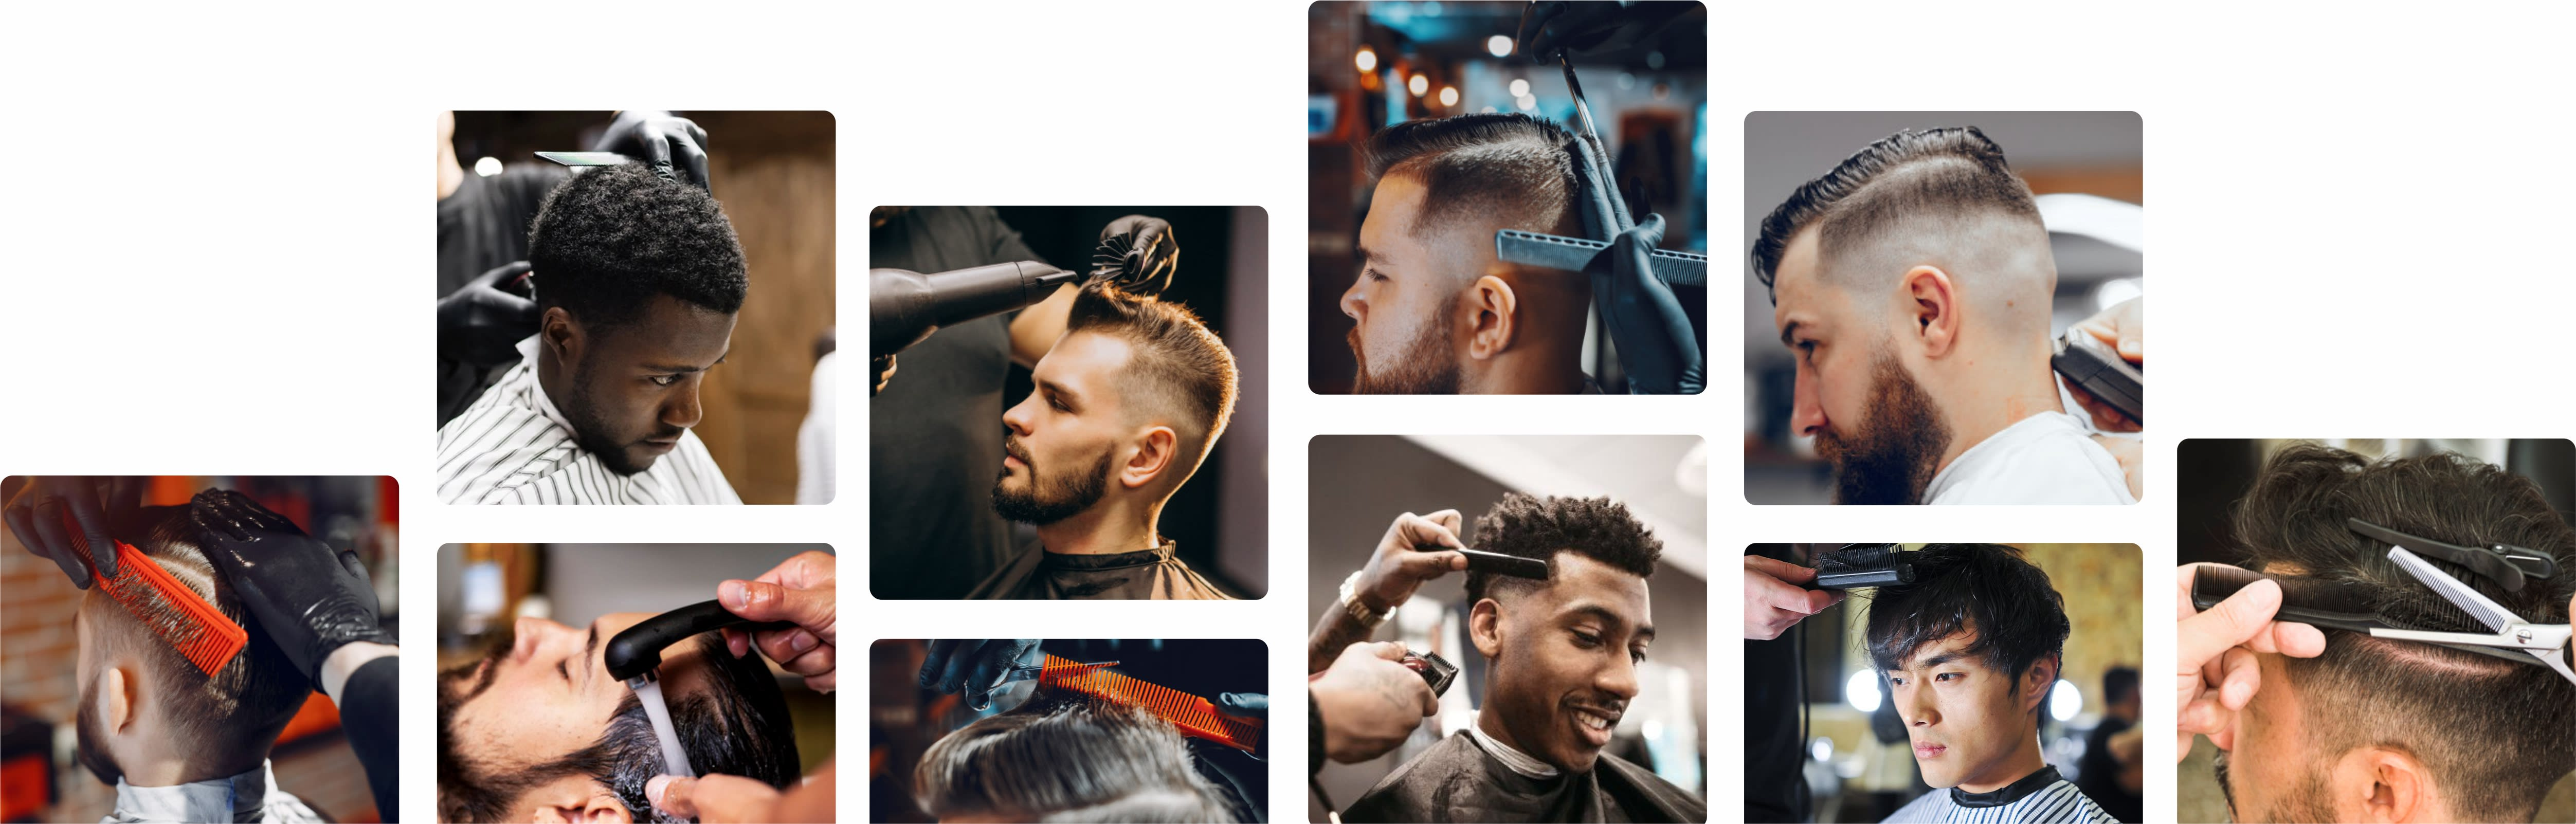 CLYPR barber barbershop app haircuts